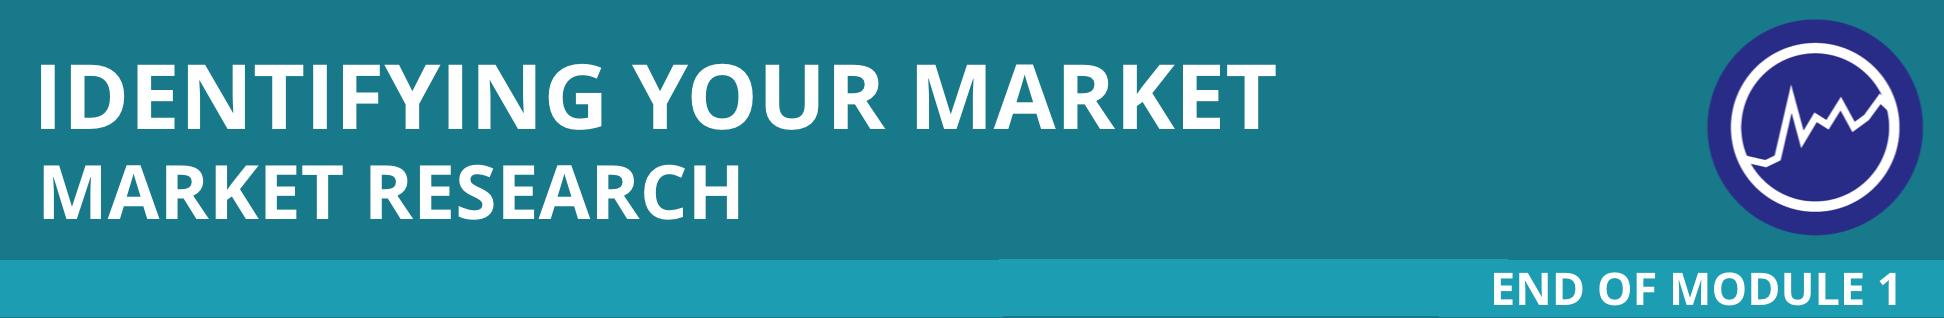 Market Research Header